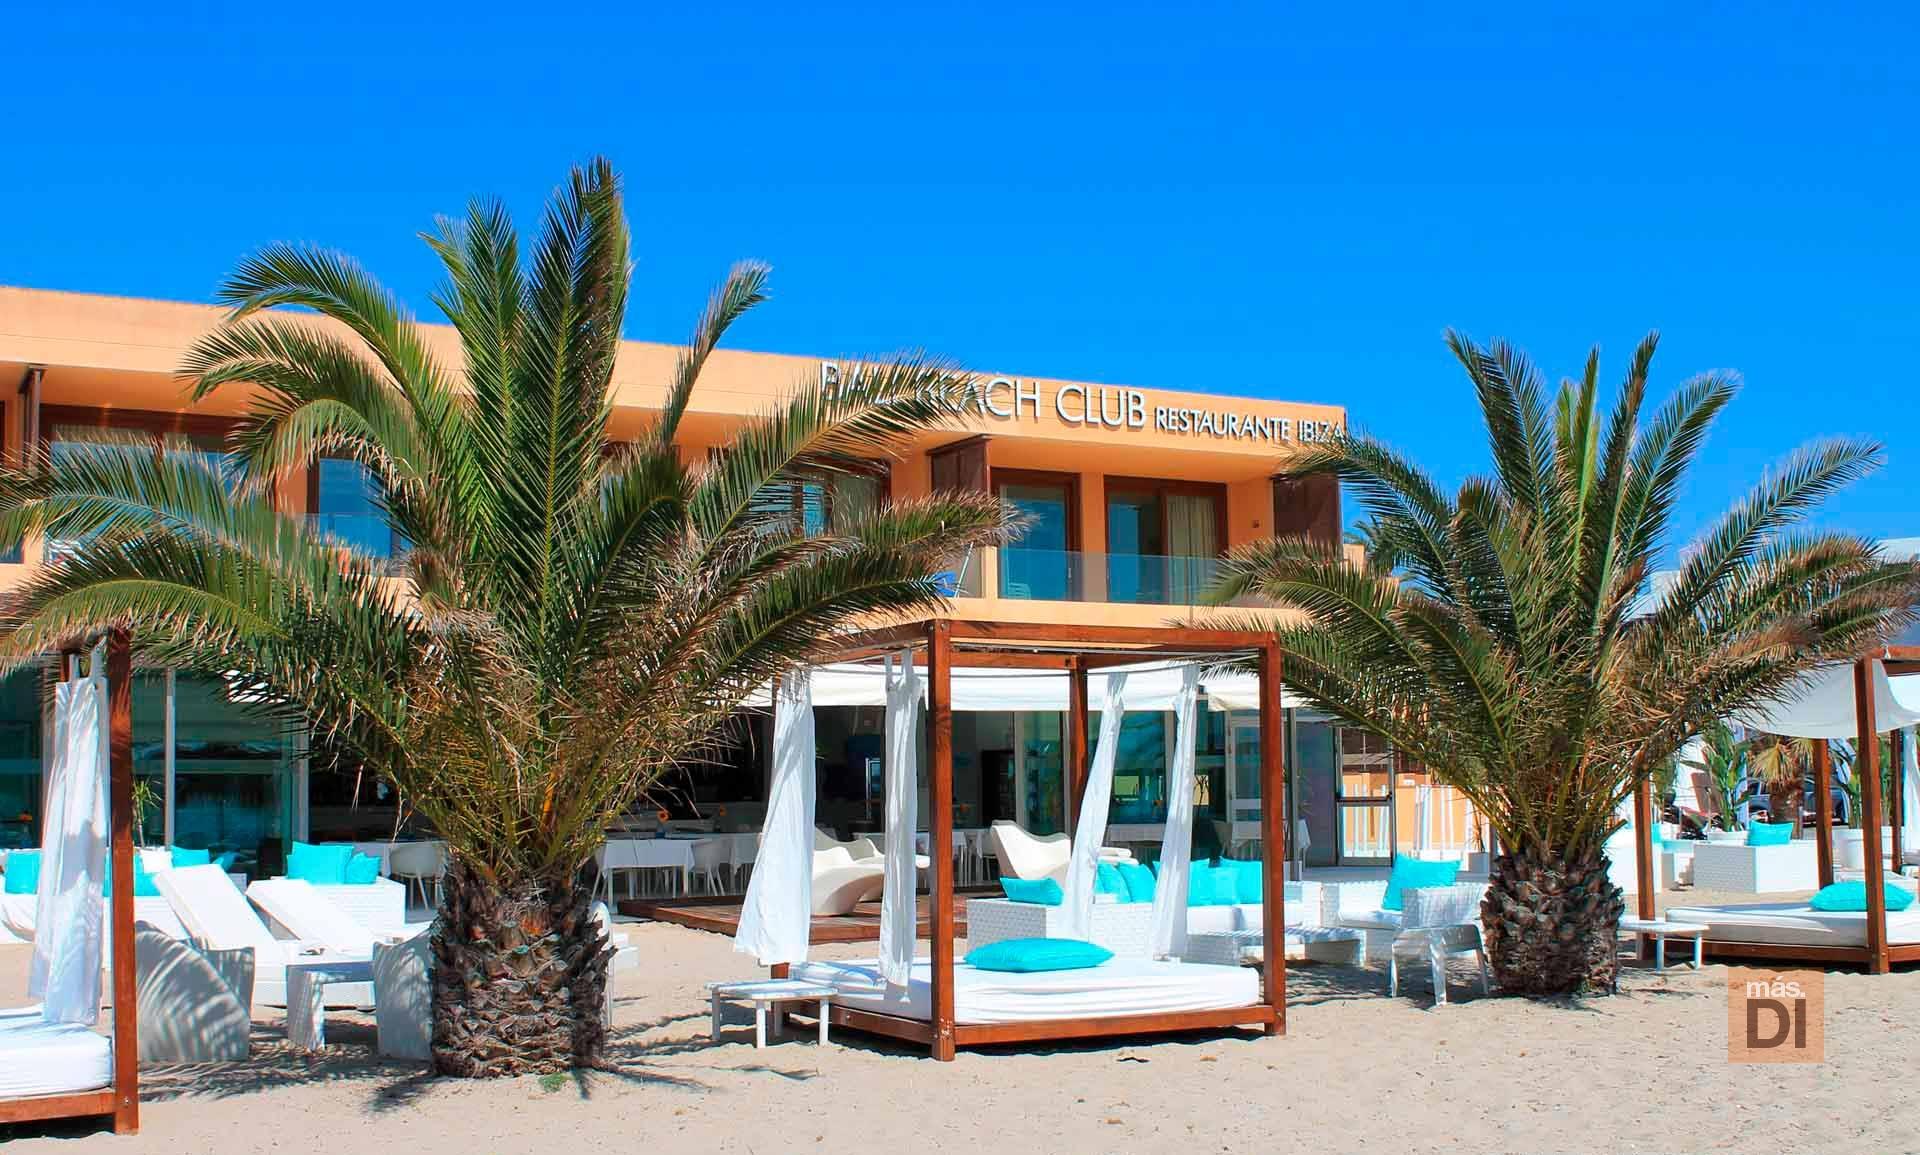 Bali Beach Club Ibiza, mar, arena y mucho sabor